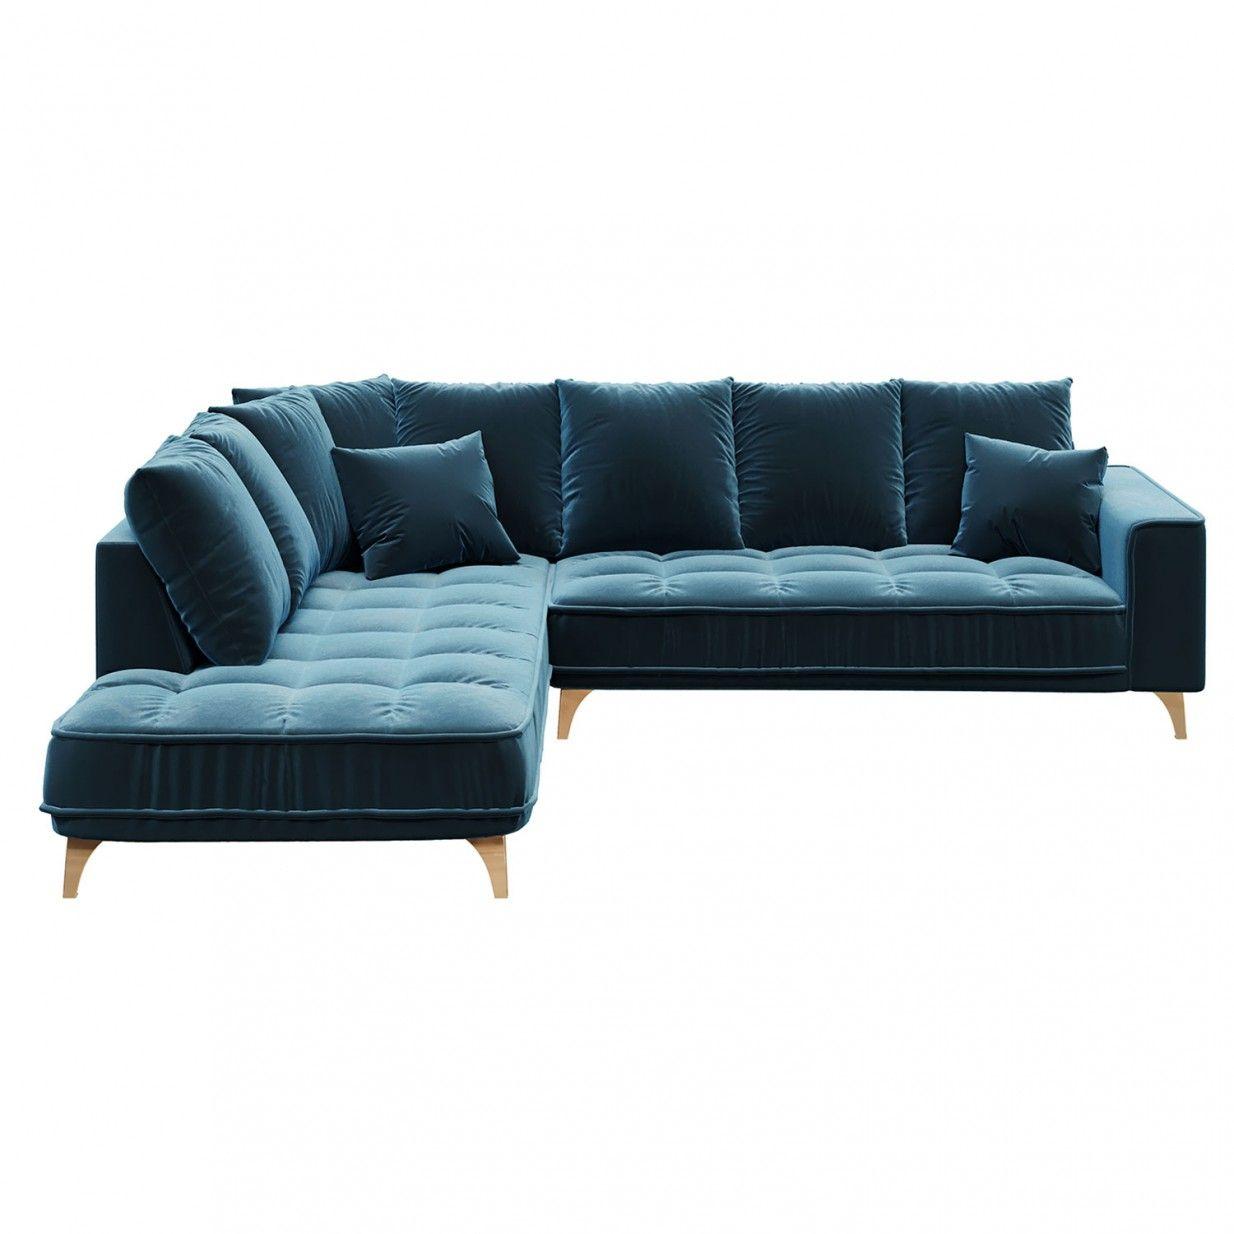 Chloe Linkes Ecksofa Blau Devichy Home Decor Sectional Couch Couch